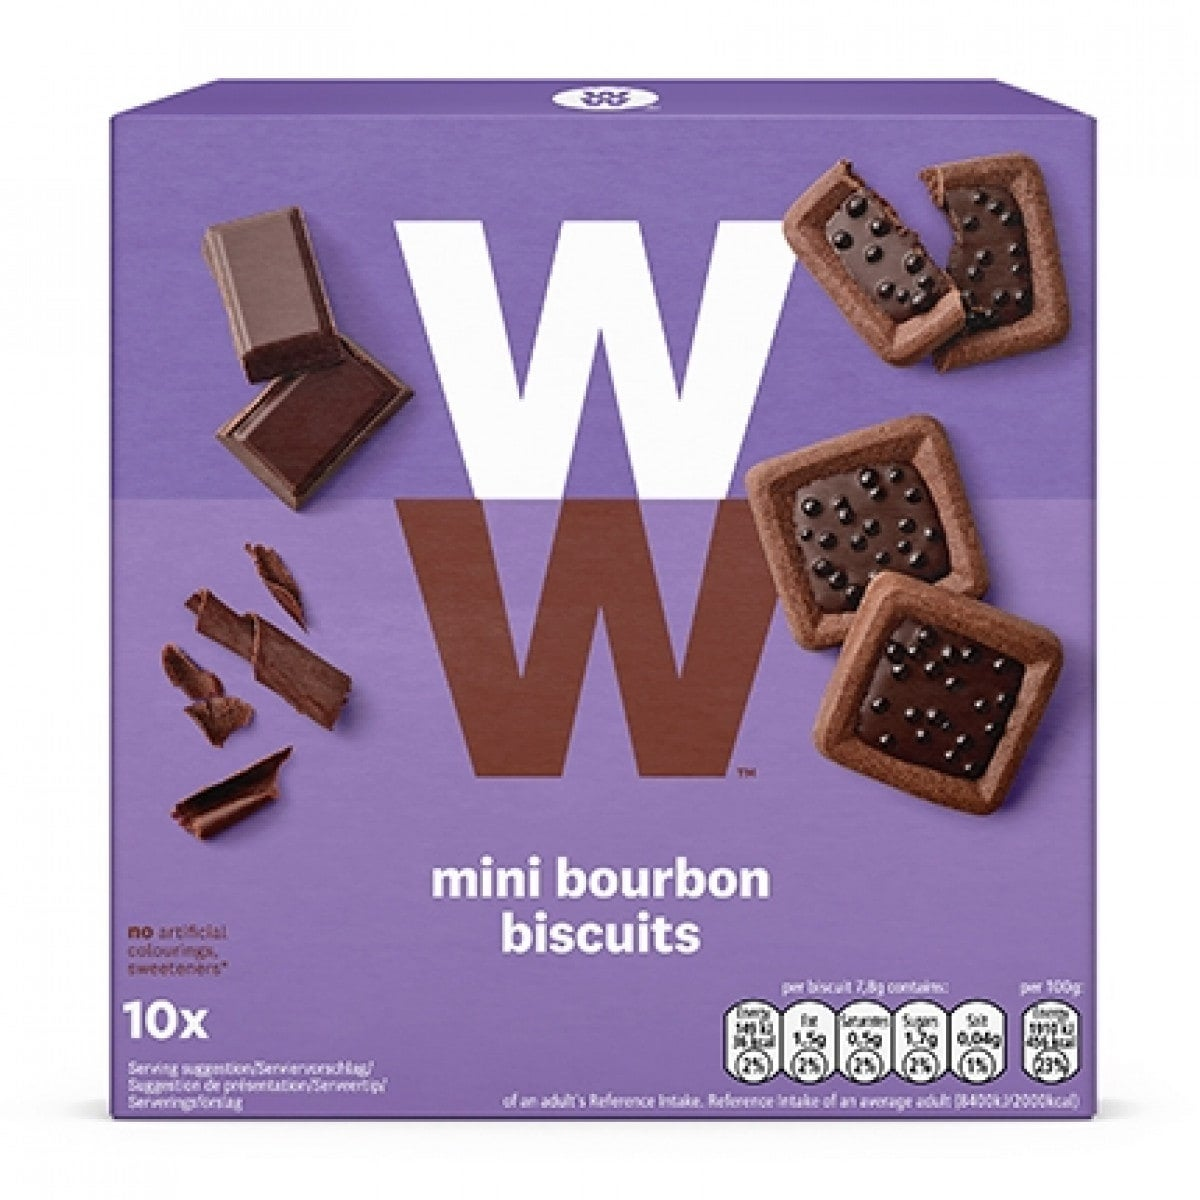 WW Kekse mit Kakaocreme